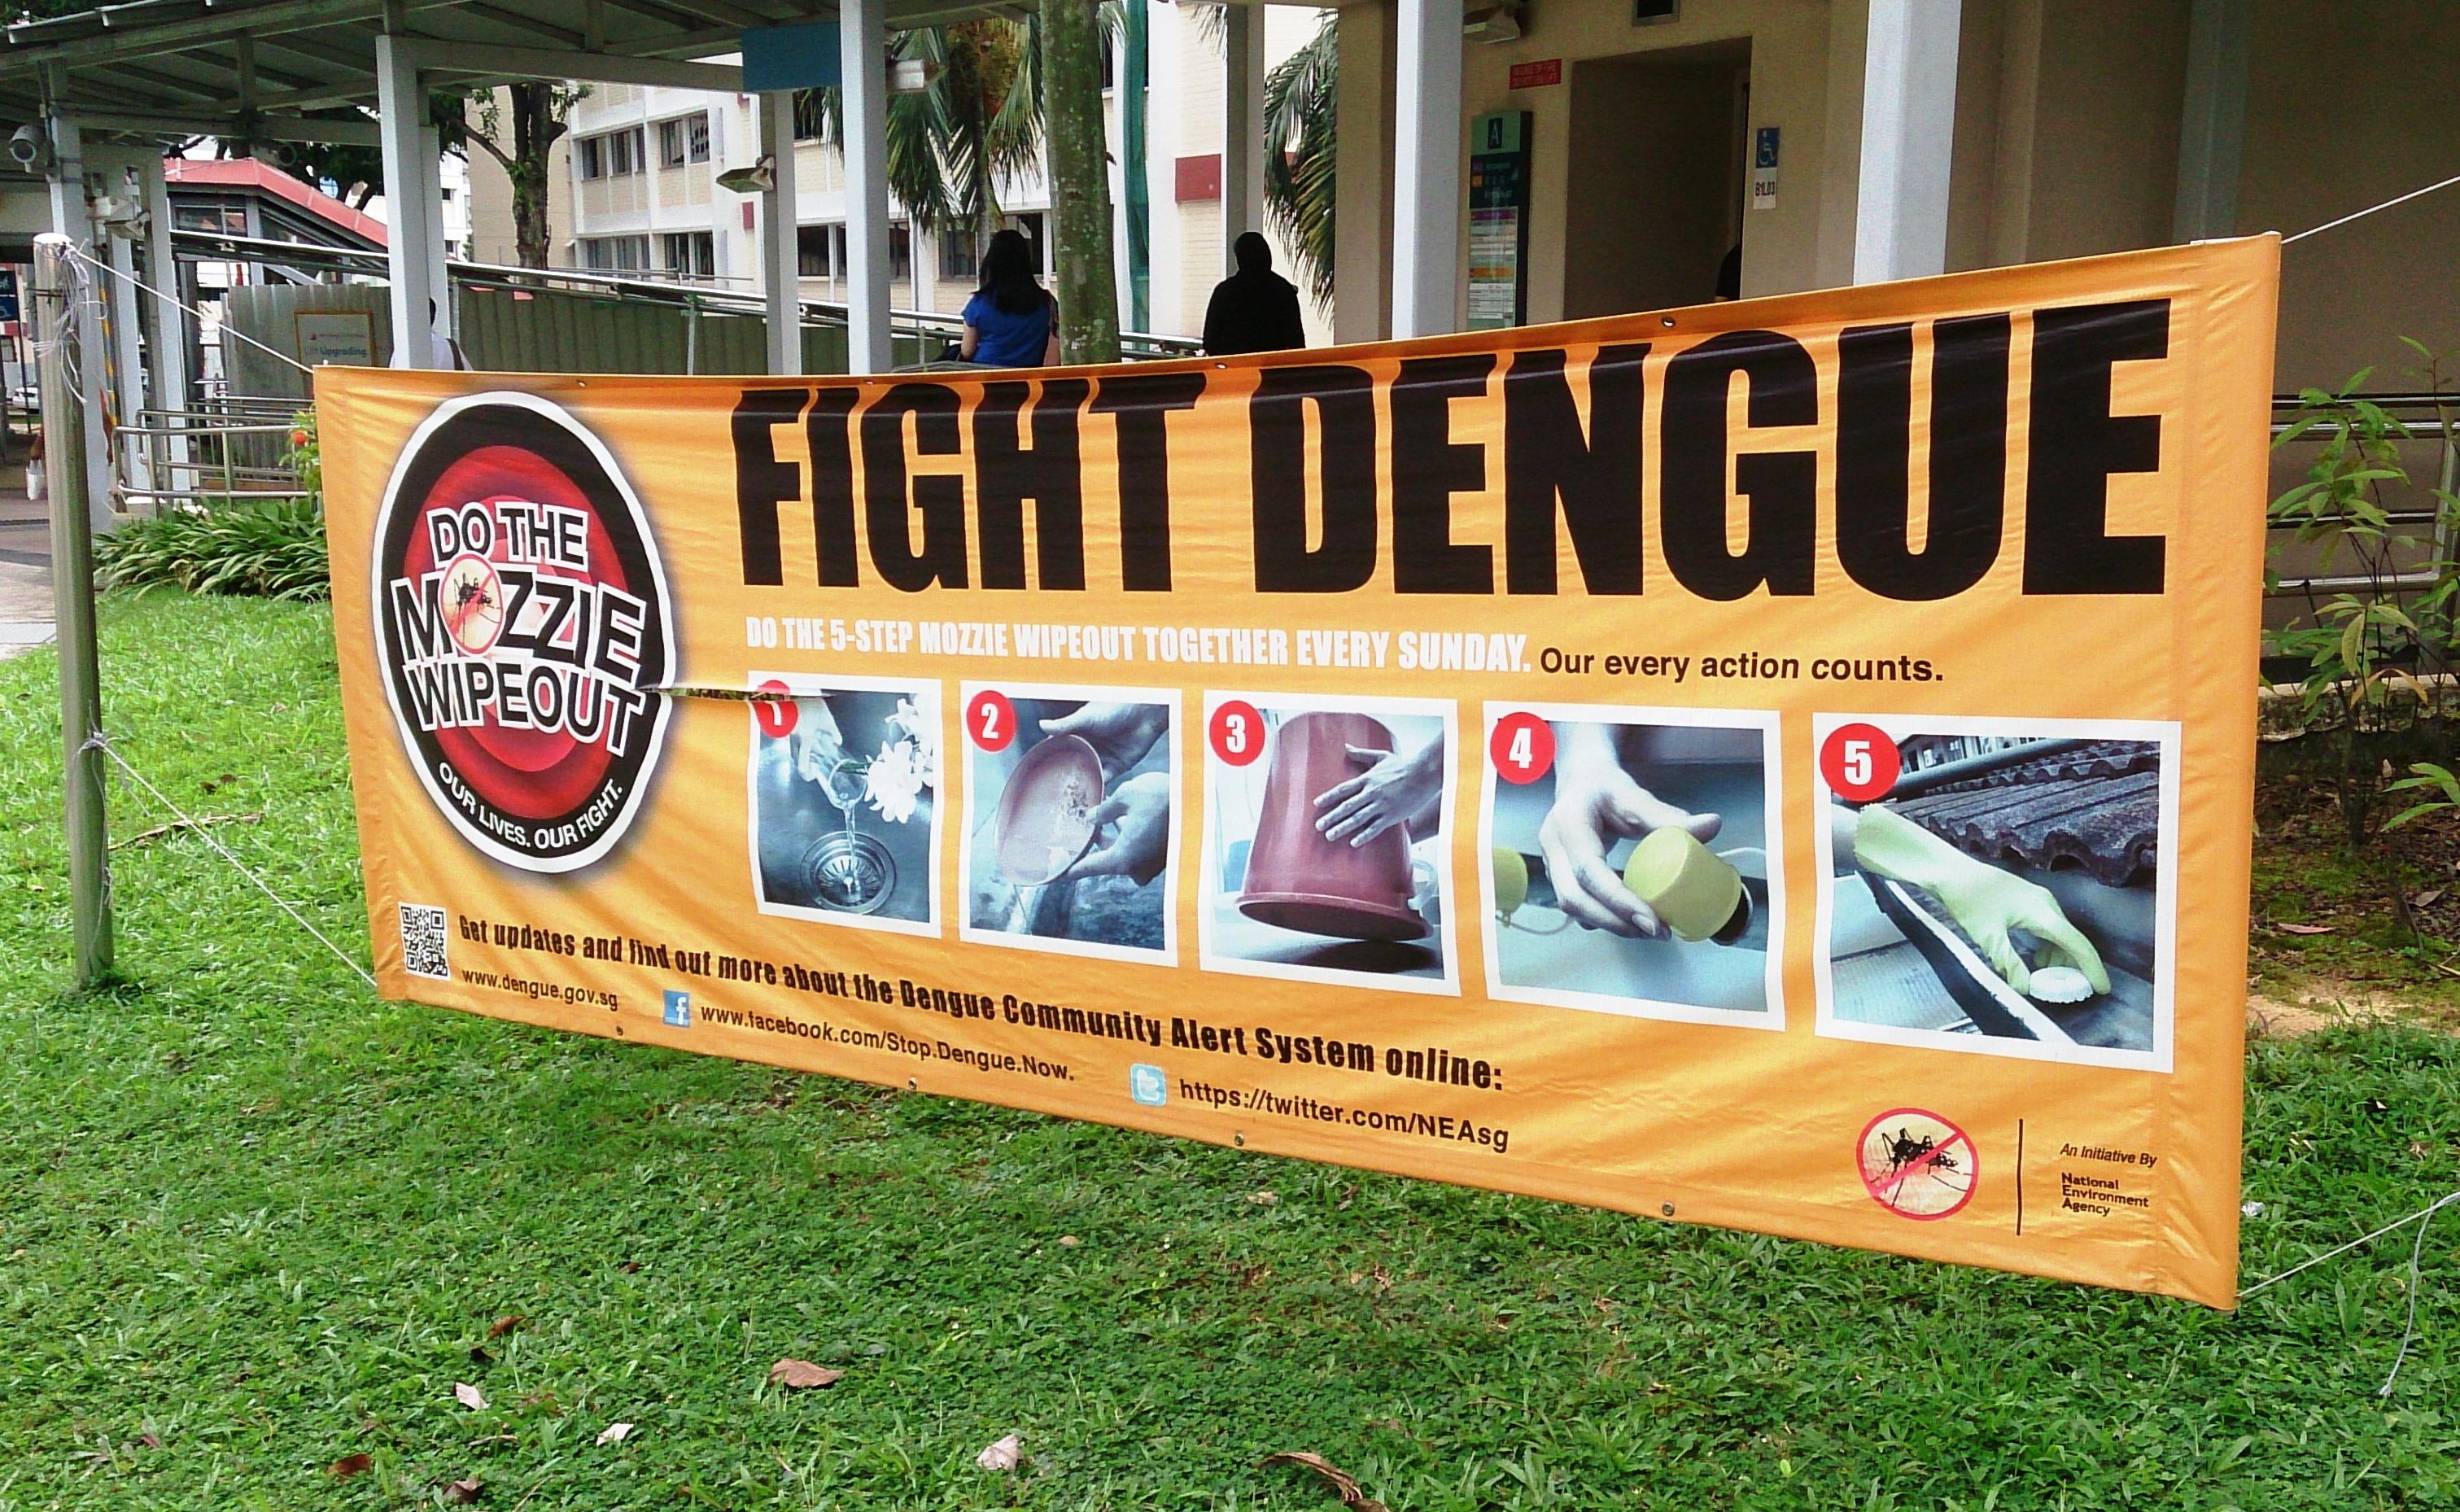 Dengue_fever_banner_(fight_dengue)